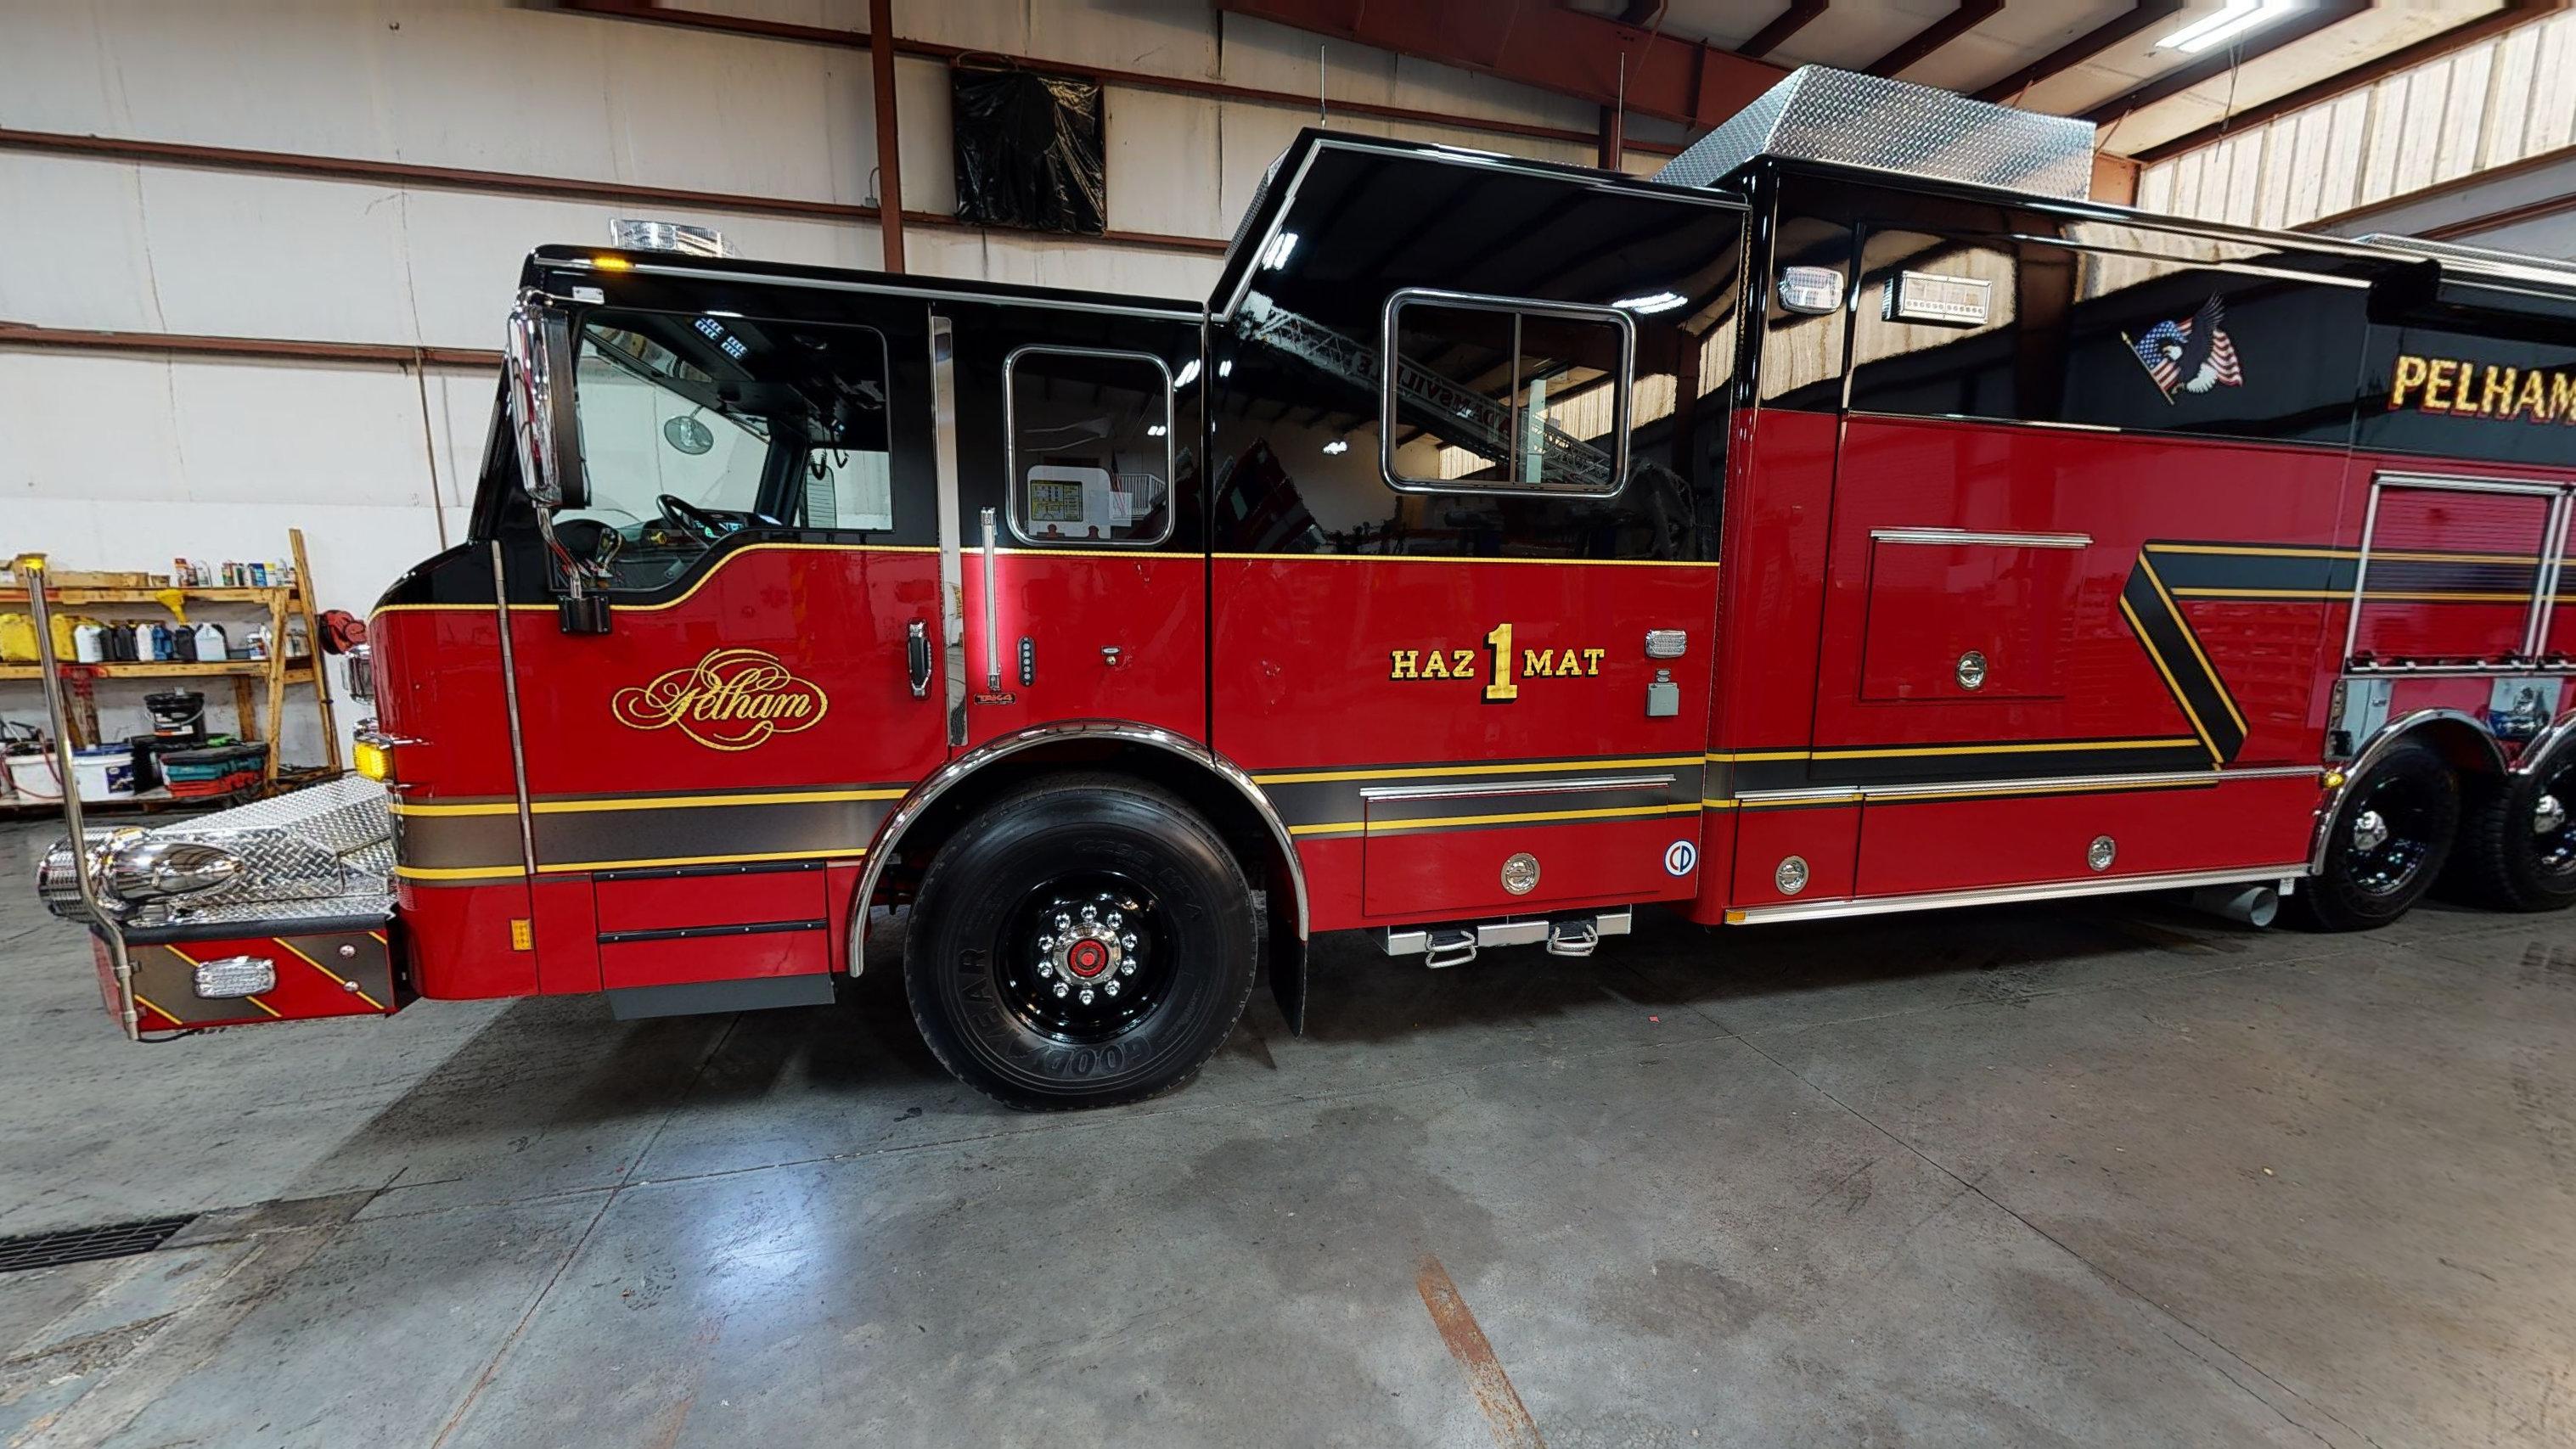 1_Pelham-Fire-Department-2019-Pierce-Velocity-HazmatCommand-Job-33168-12092020_072213